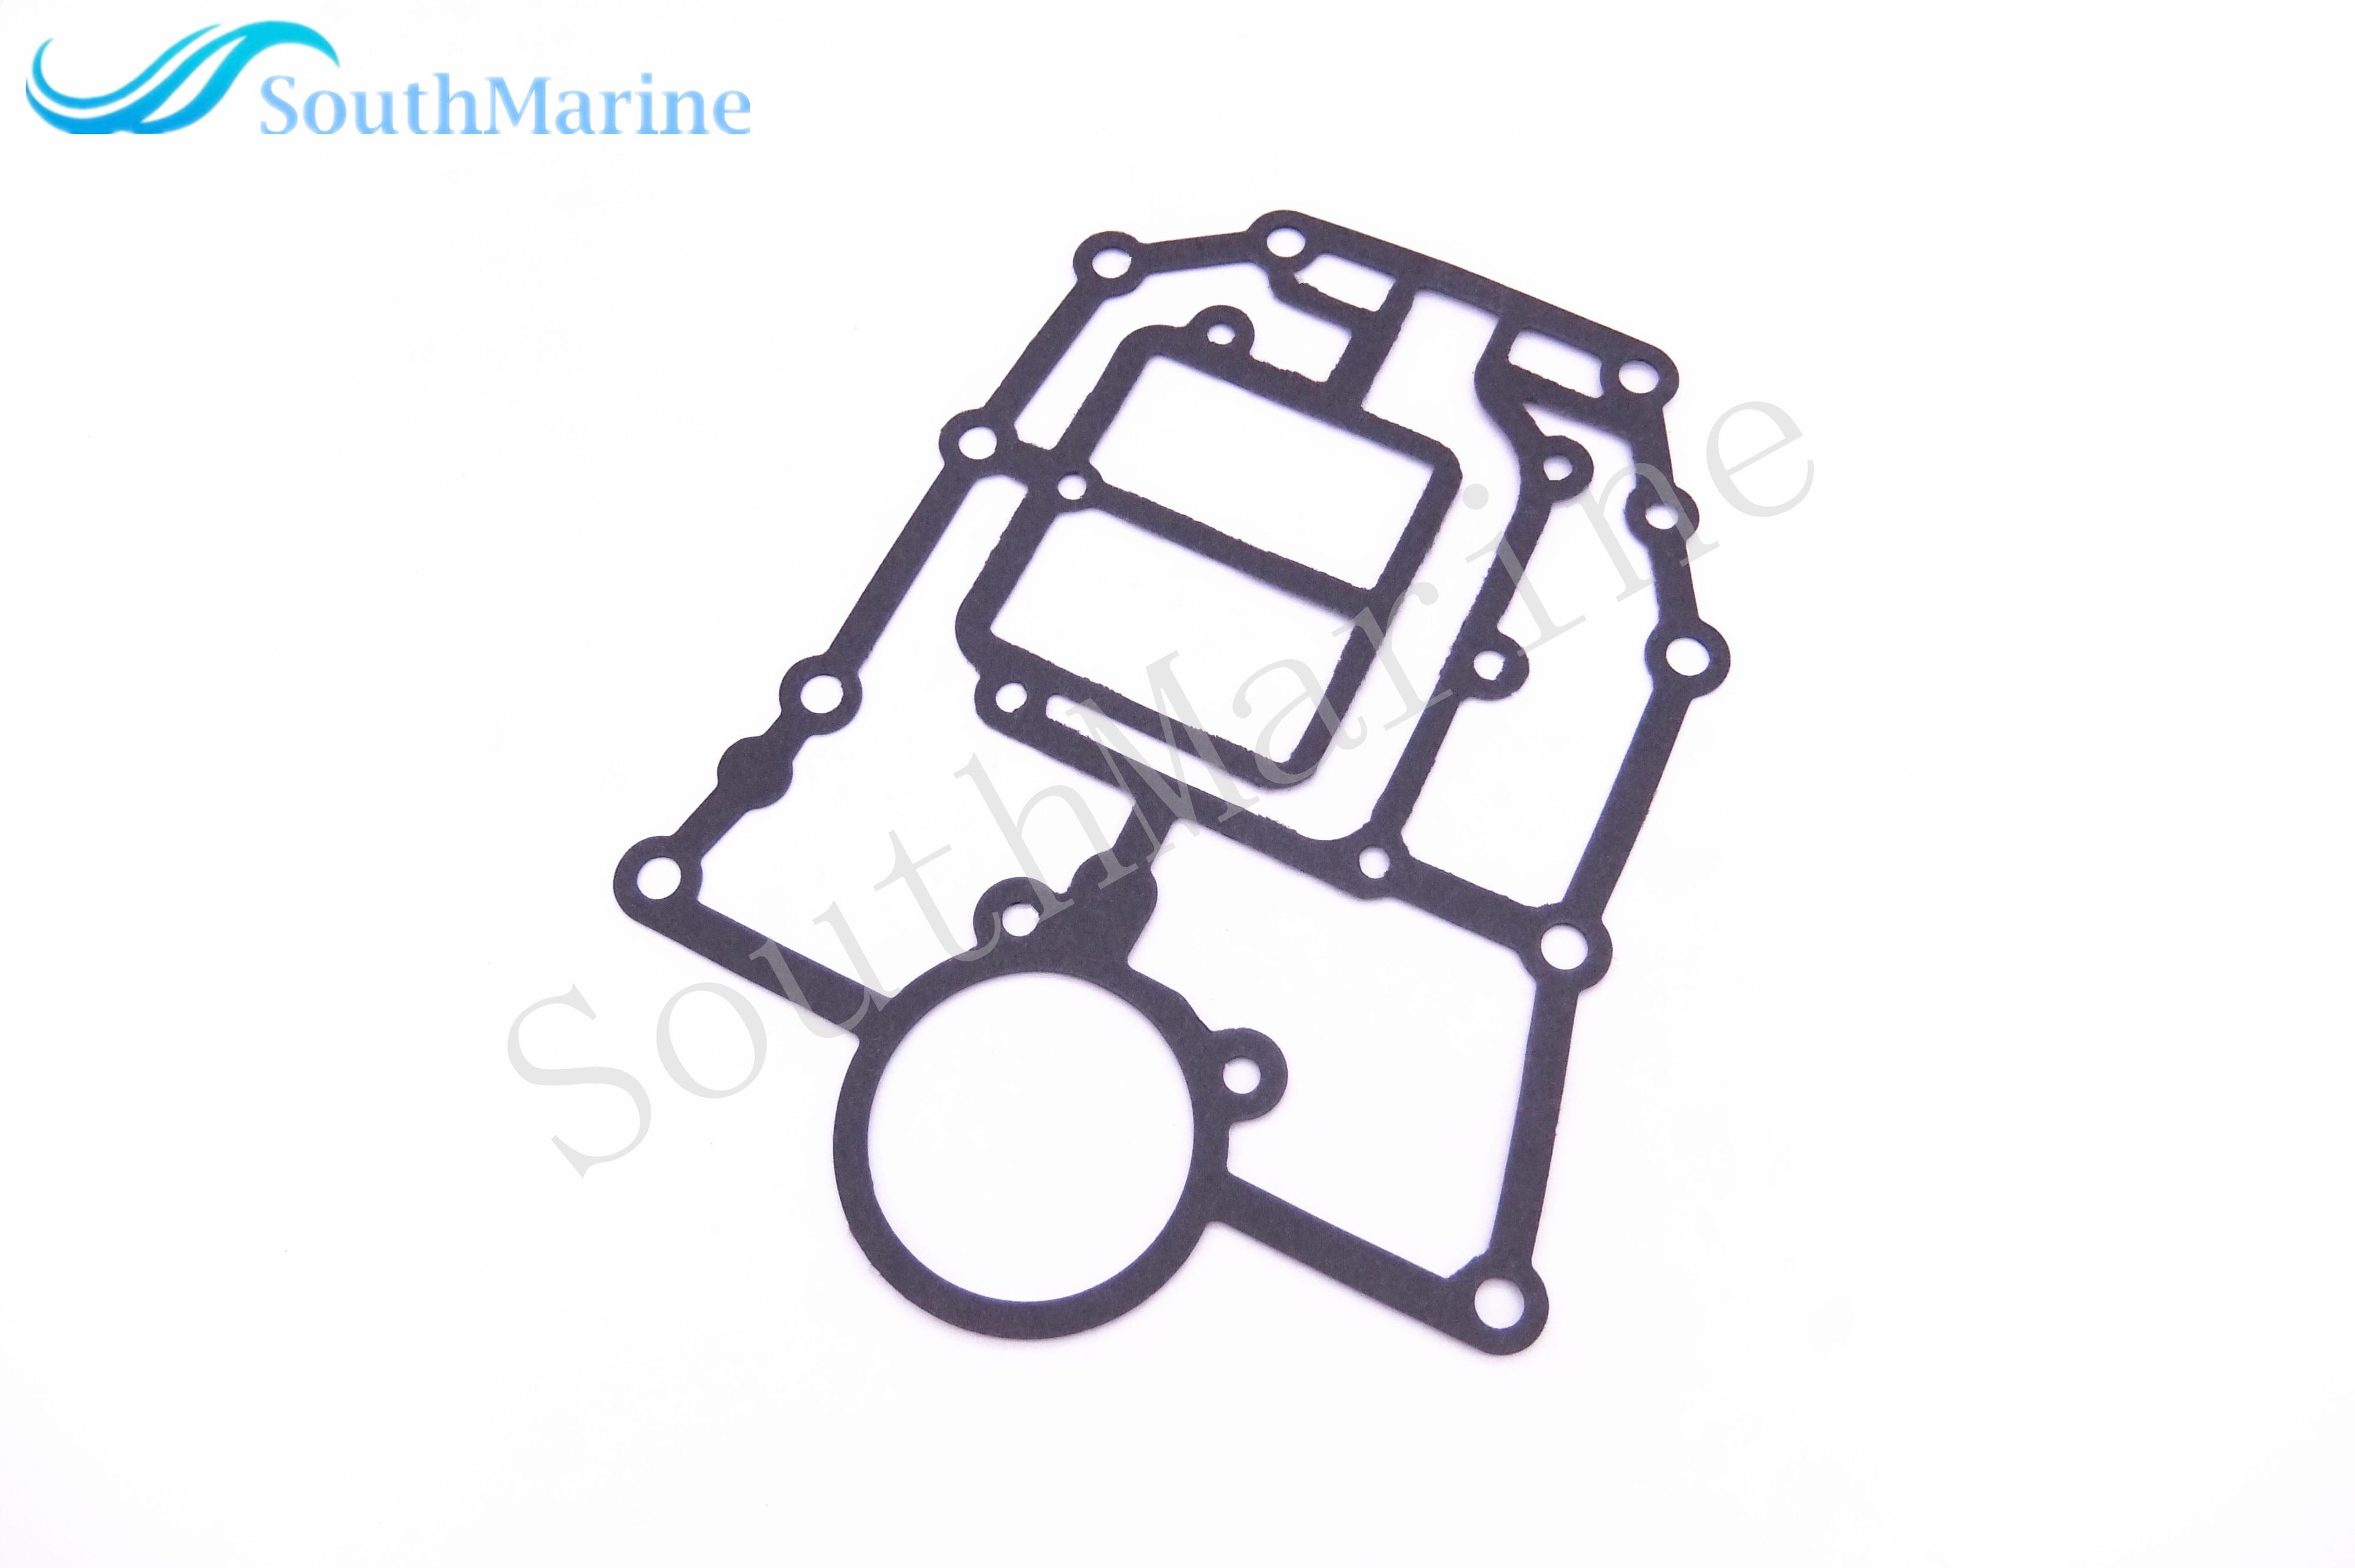 11433 94412 boat motor gasket under oil seal for suzuki 40hp dt40 outboard engine 11433 94411 [ 4000 x 2664 Pixel ]